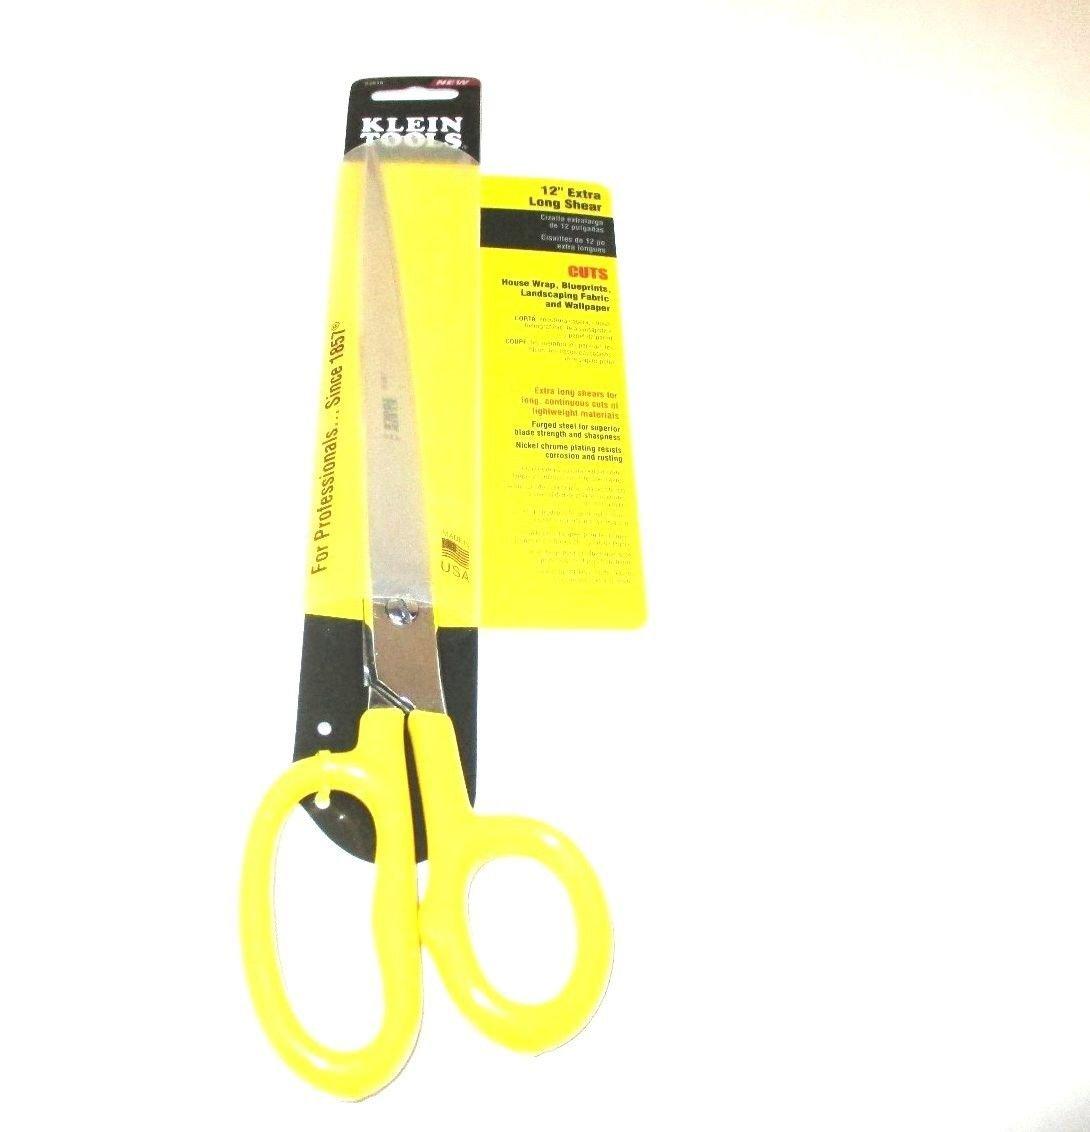 Klein Tools 12'' Extra Long Shear 23016